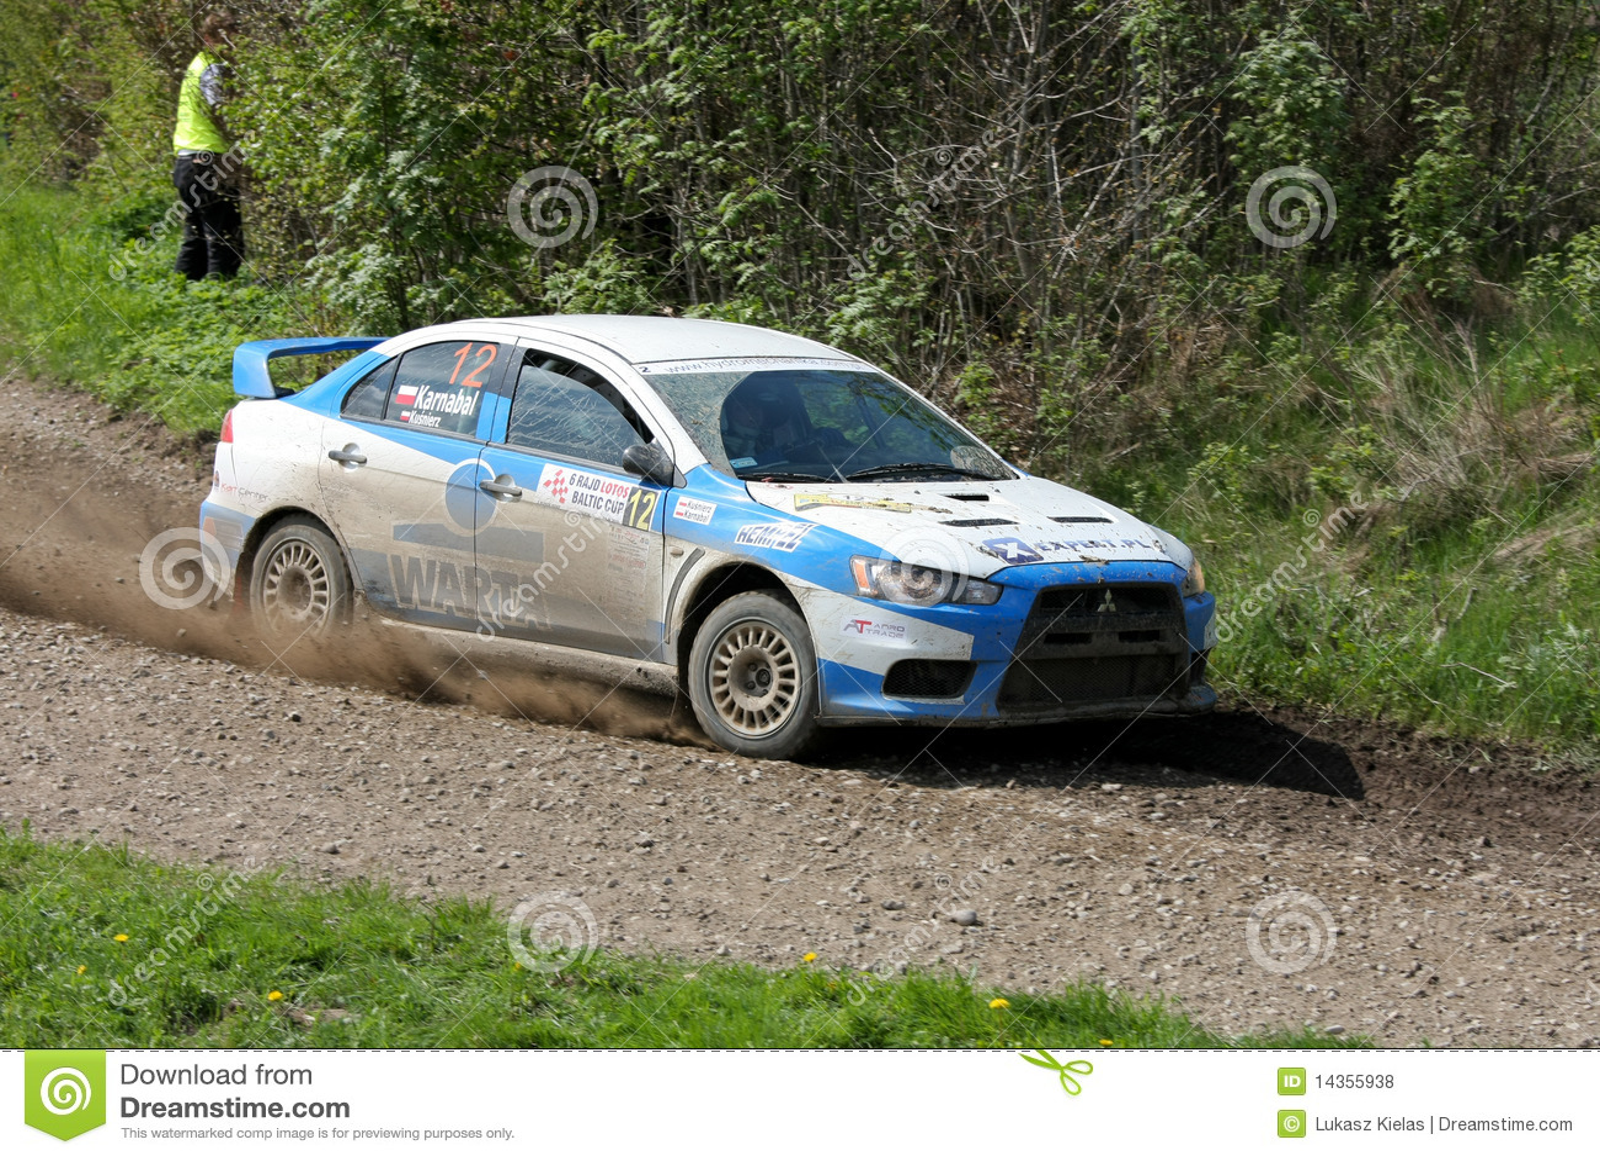 Mitsubishi Lancer EVO WRC racing